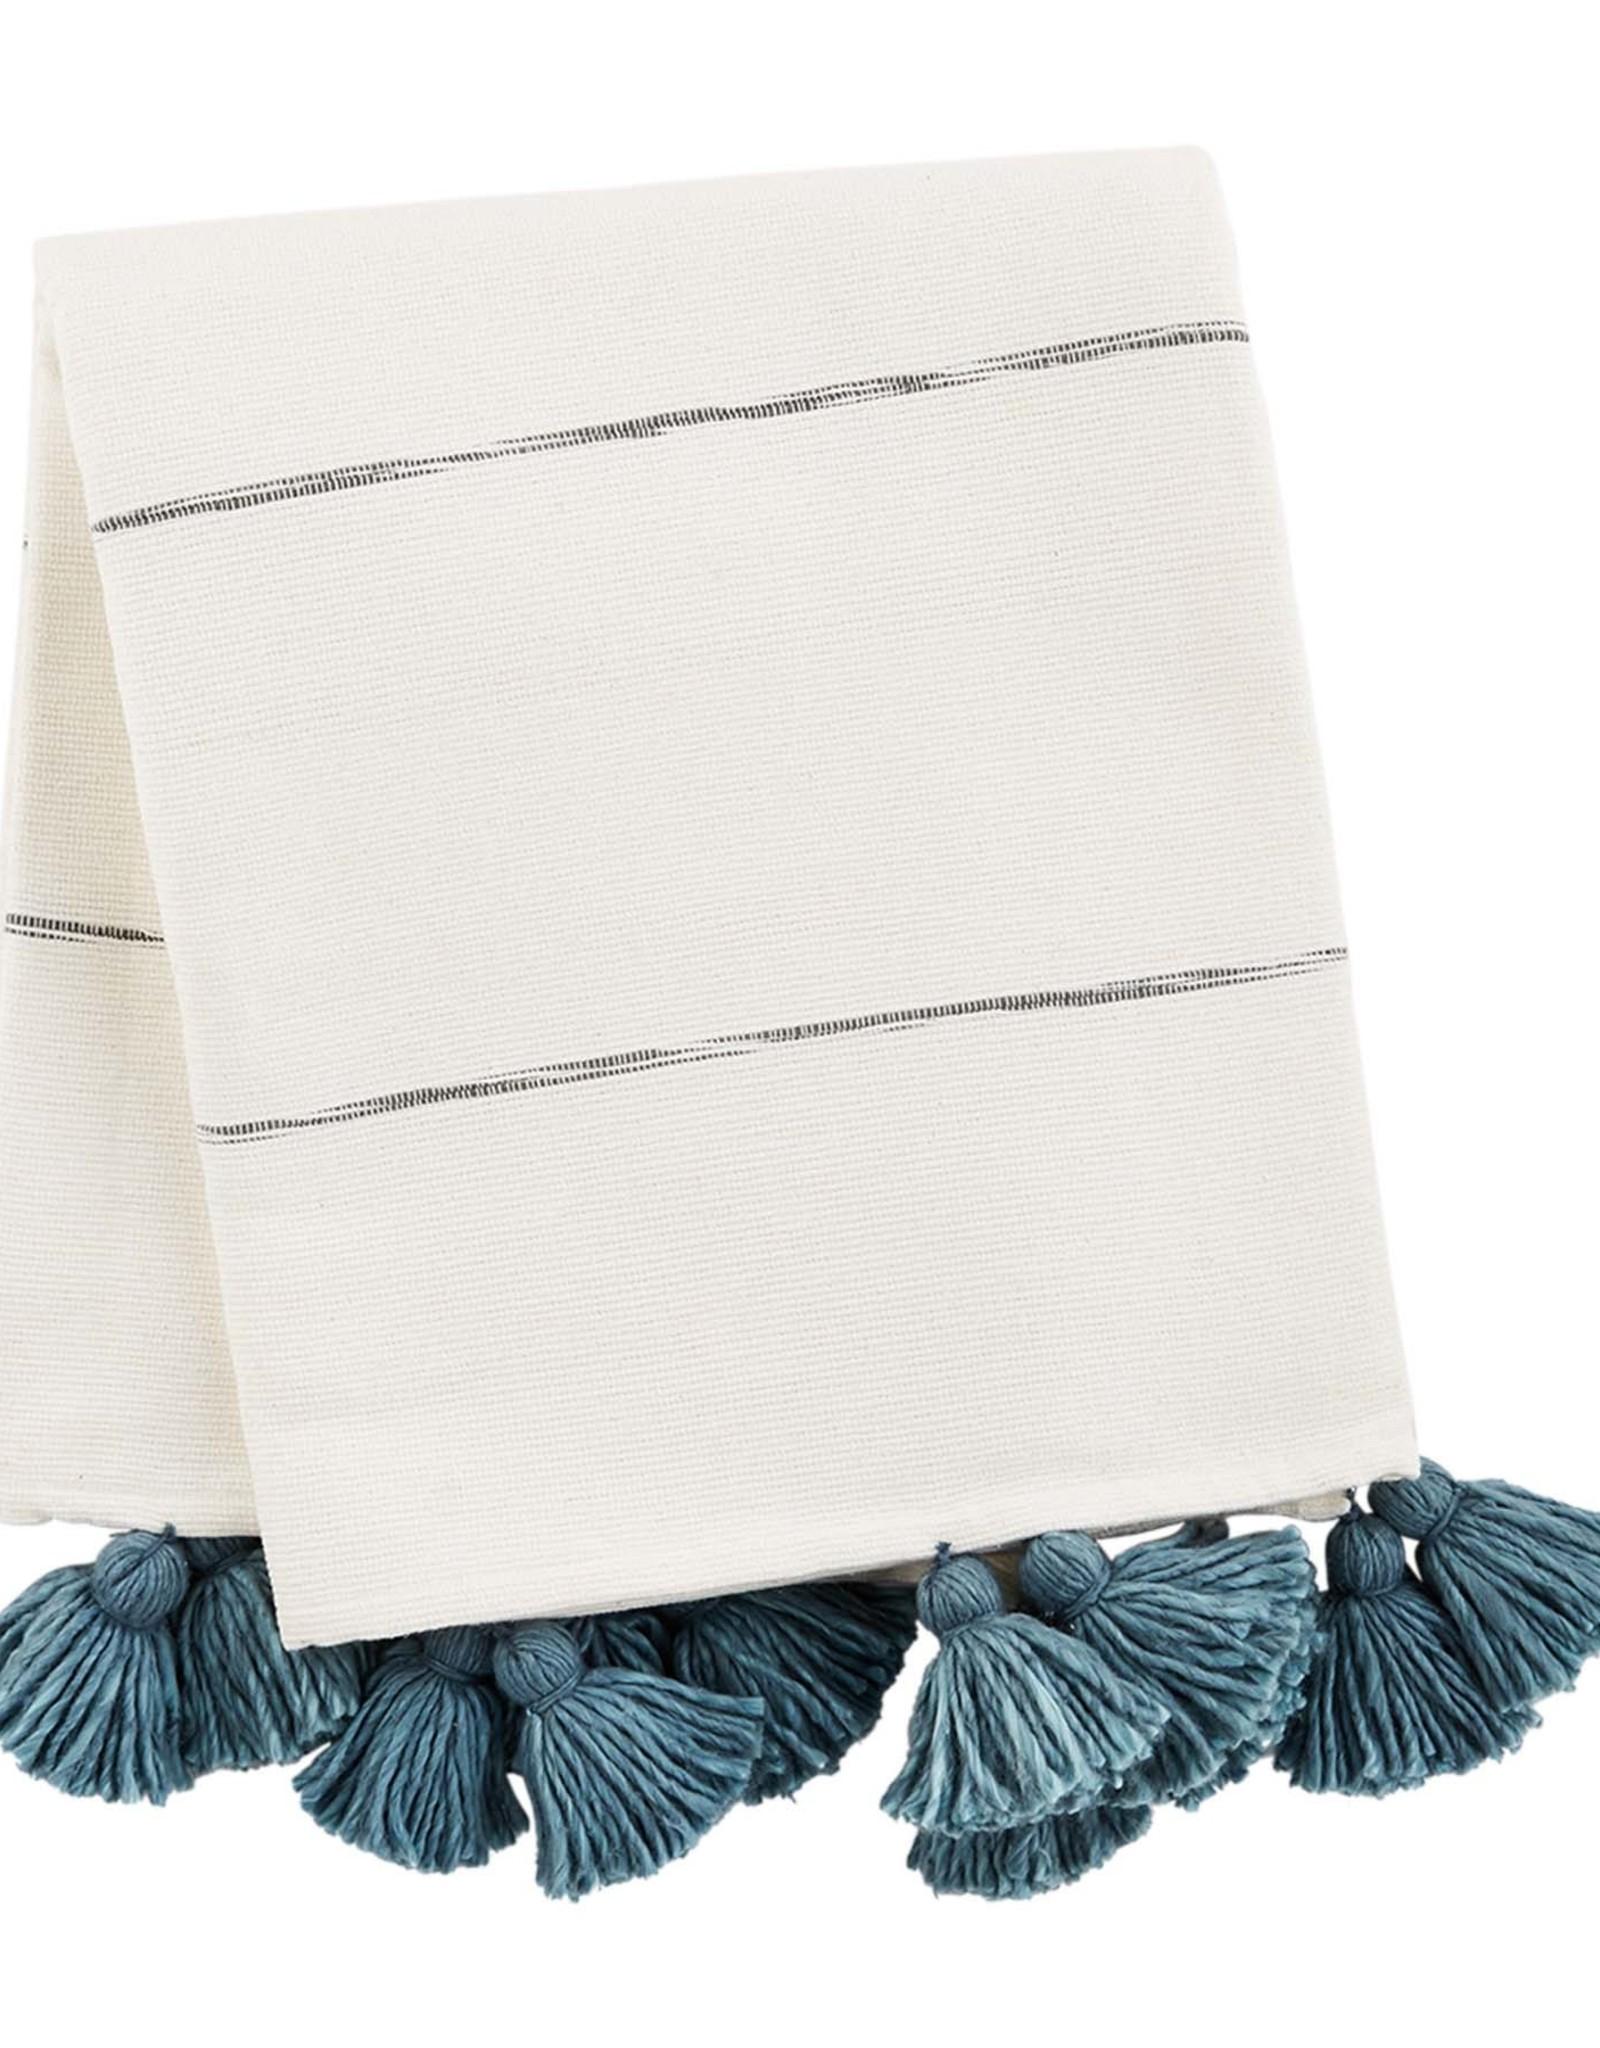 Tassel Throw - Blue